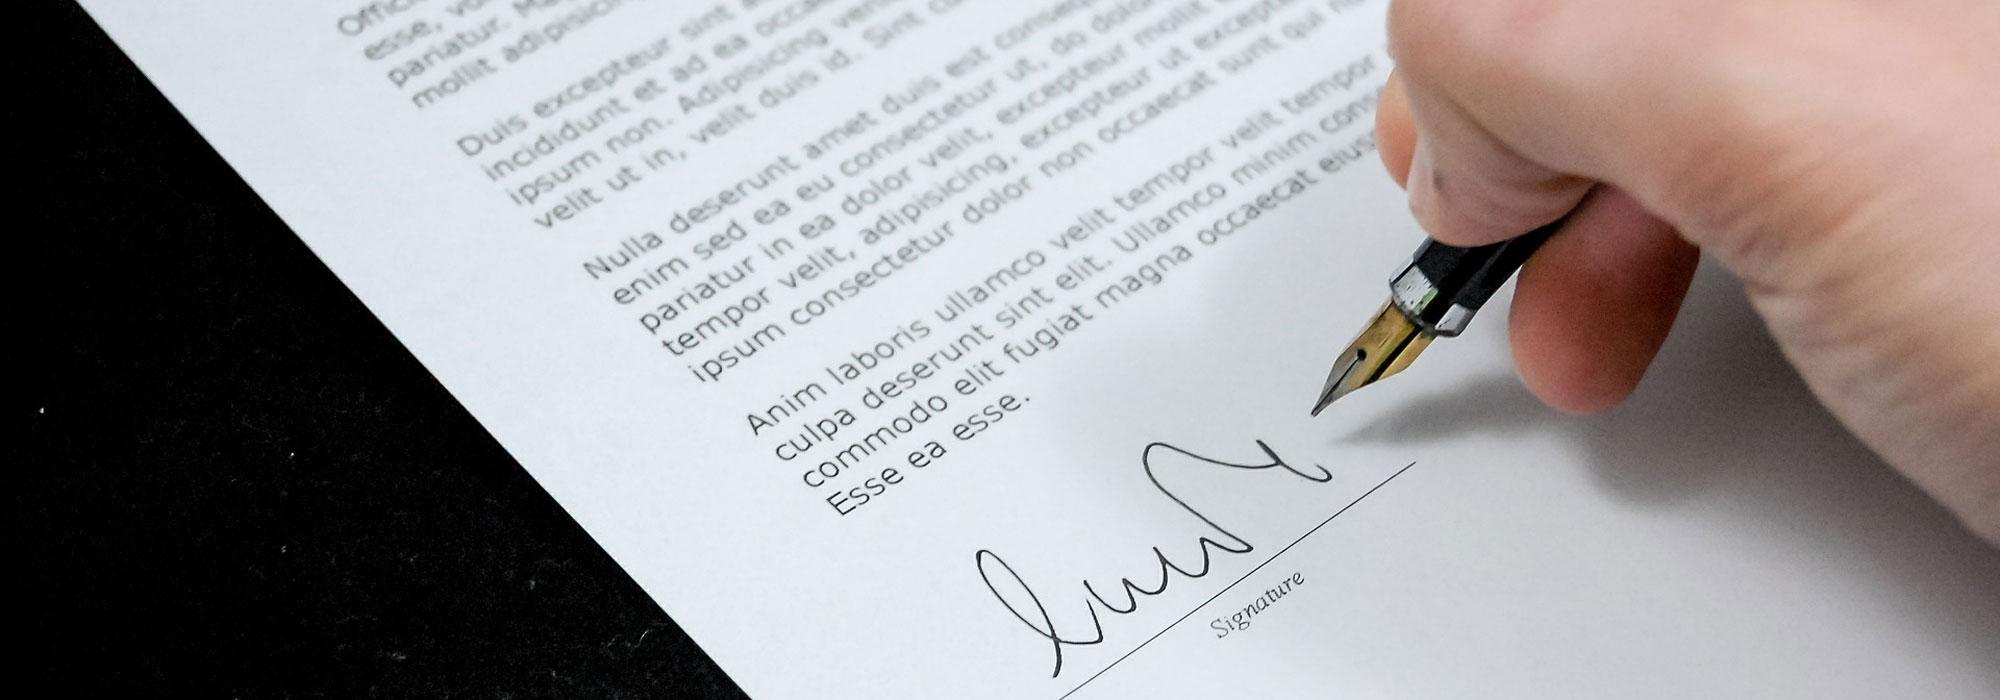 underskriver testamente